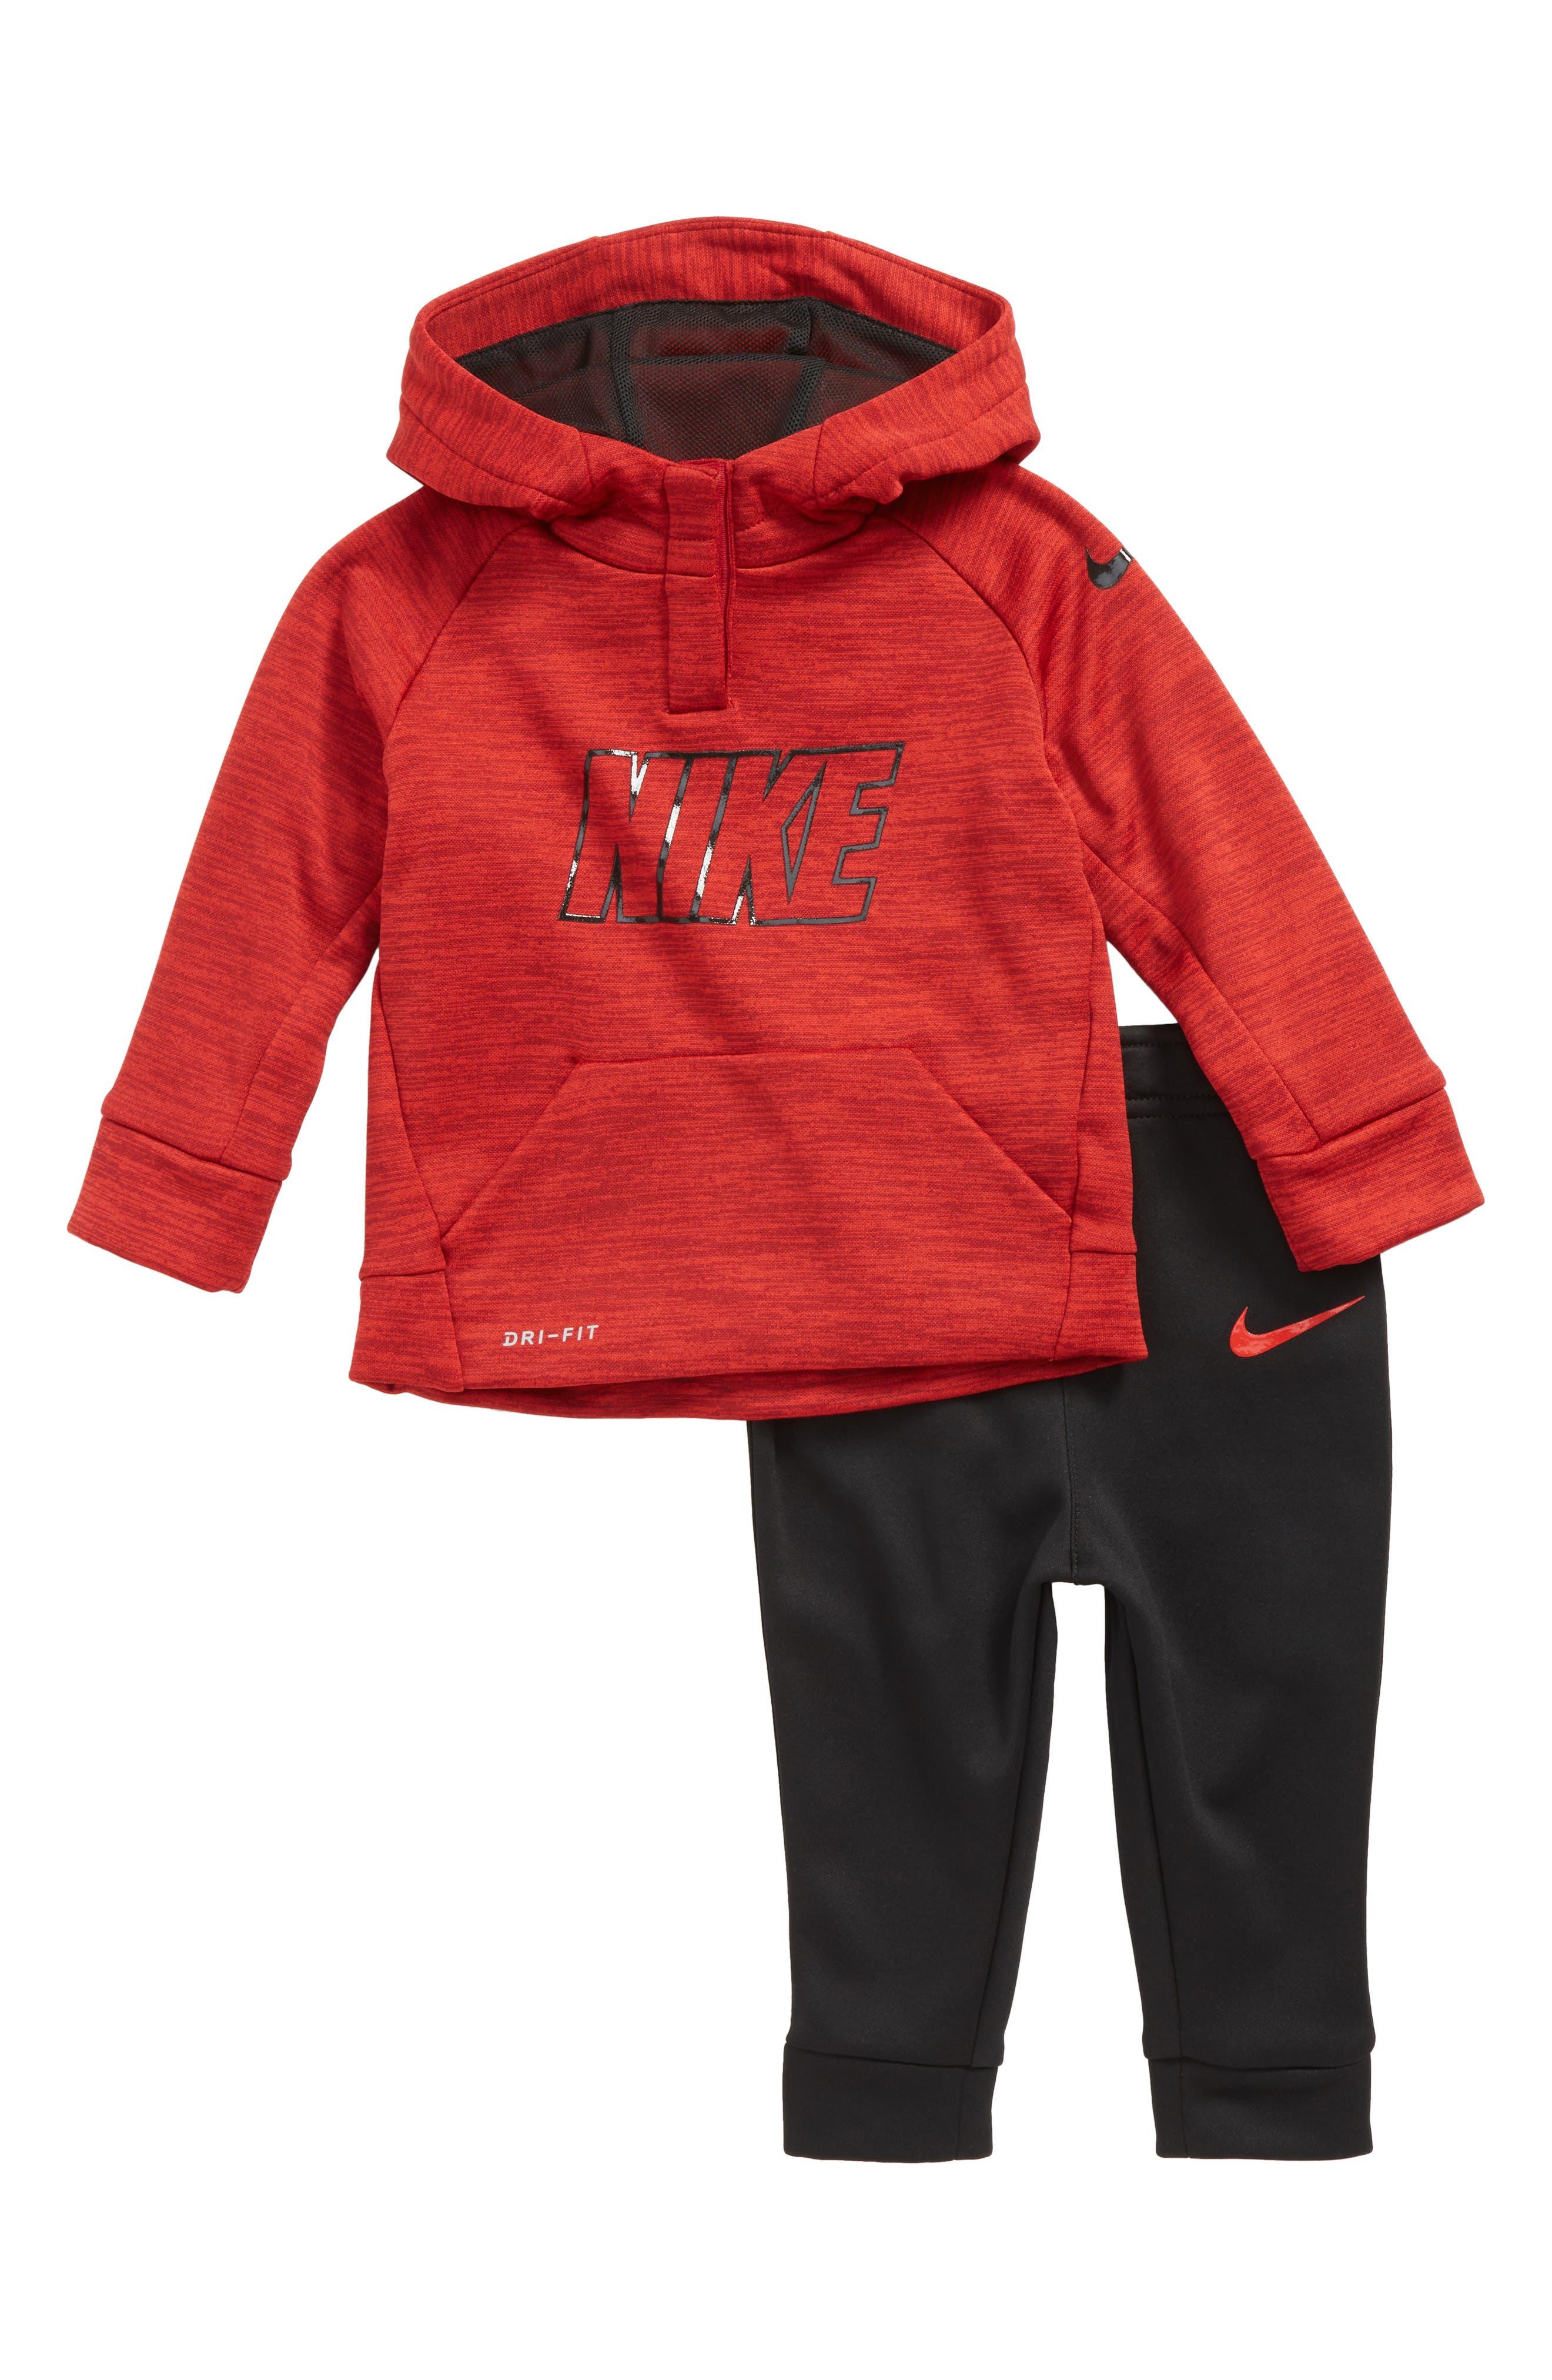 Main Image - Nike Logo Therma-FIT Fleece Hoodie & Pants Set (Baby Boys)